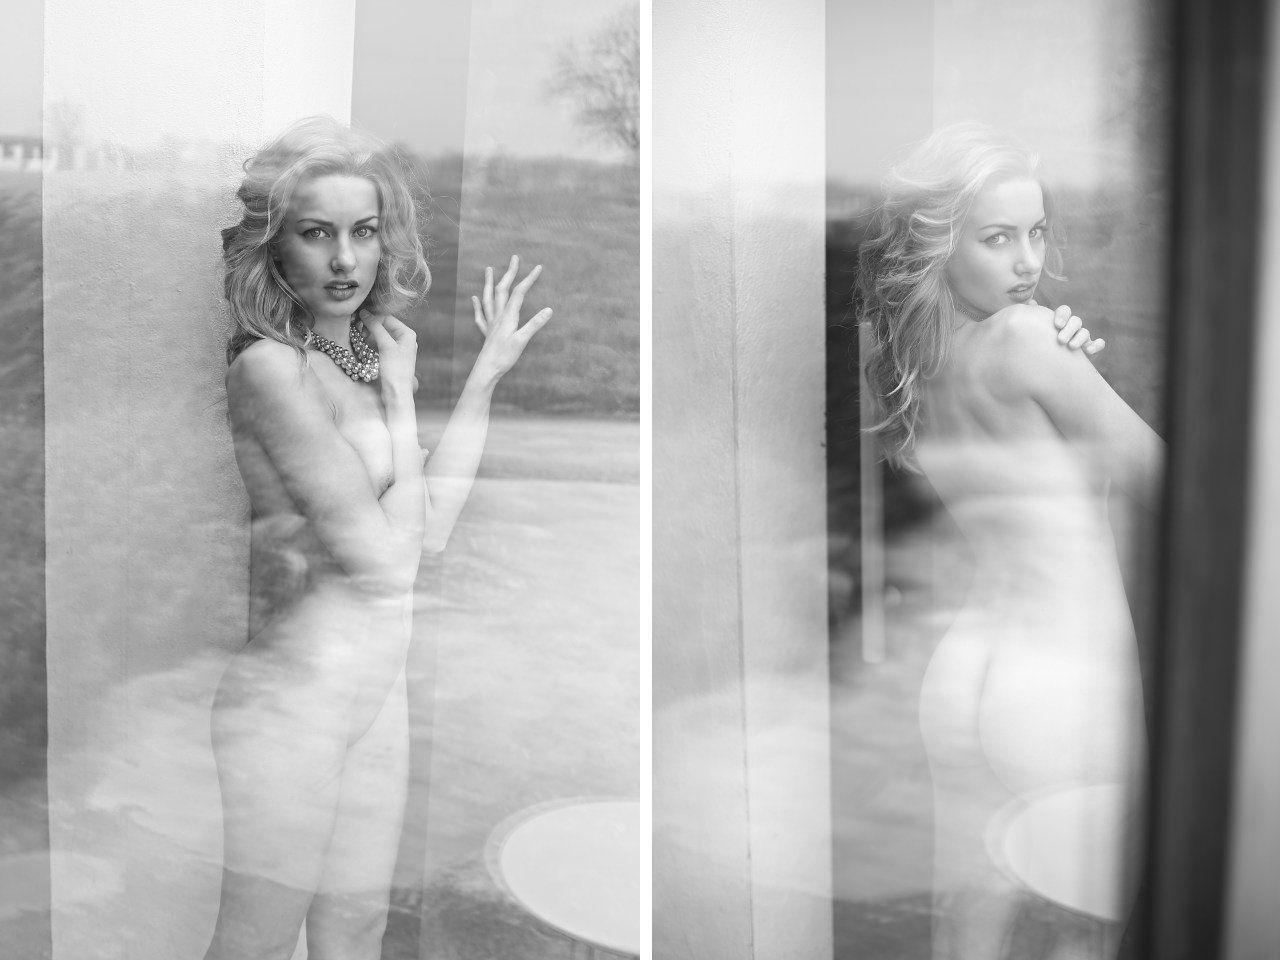 Martina Ramundo nude (68 photo), pictures Sexy, Twitter, butt 2019